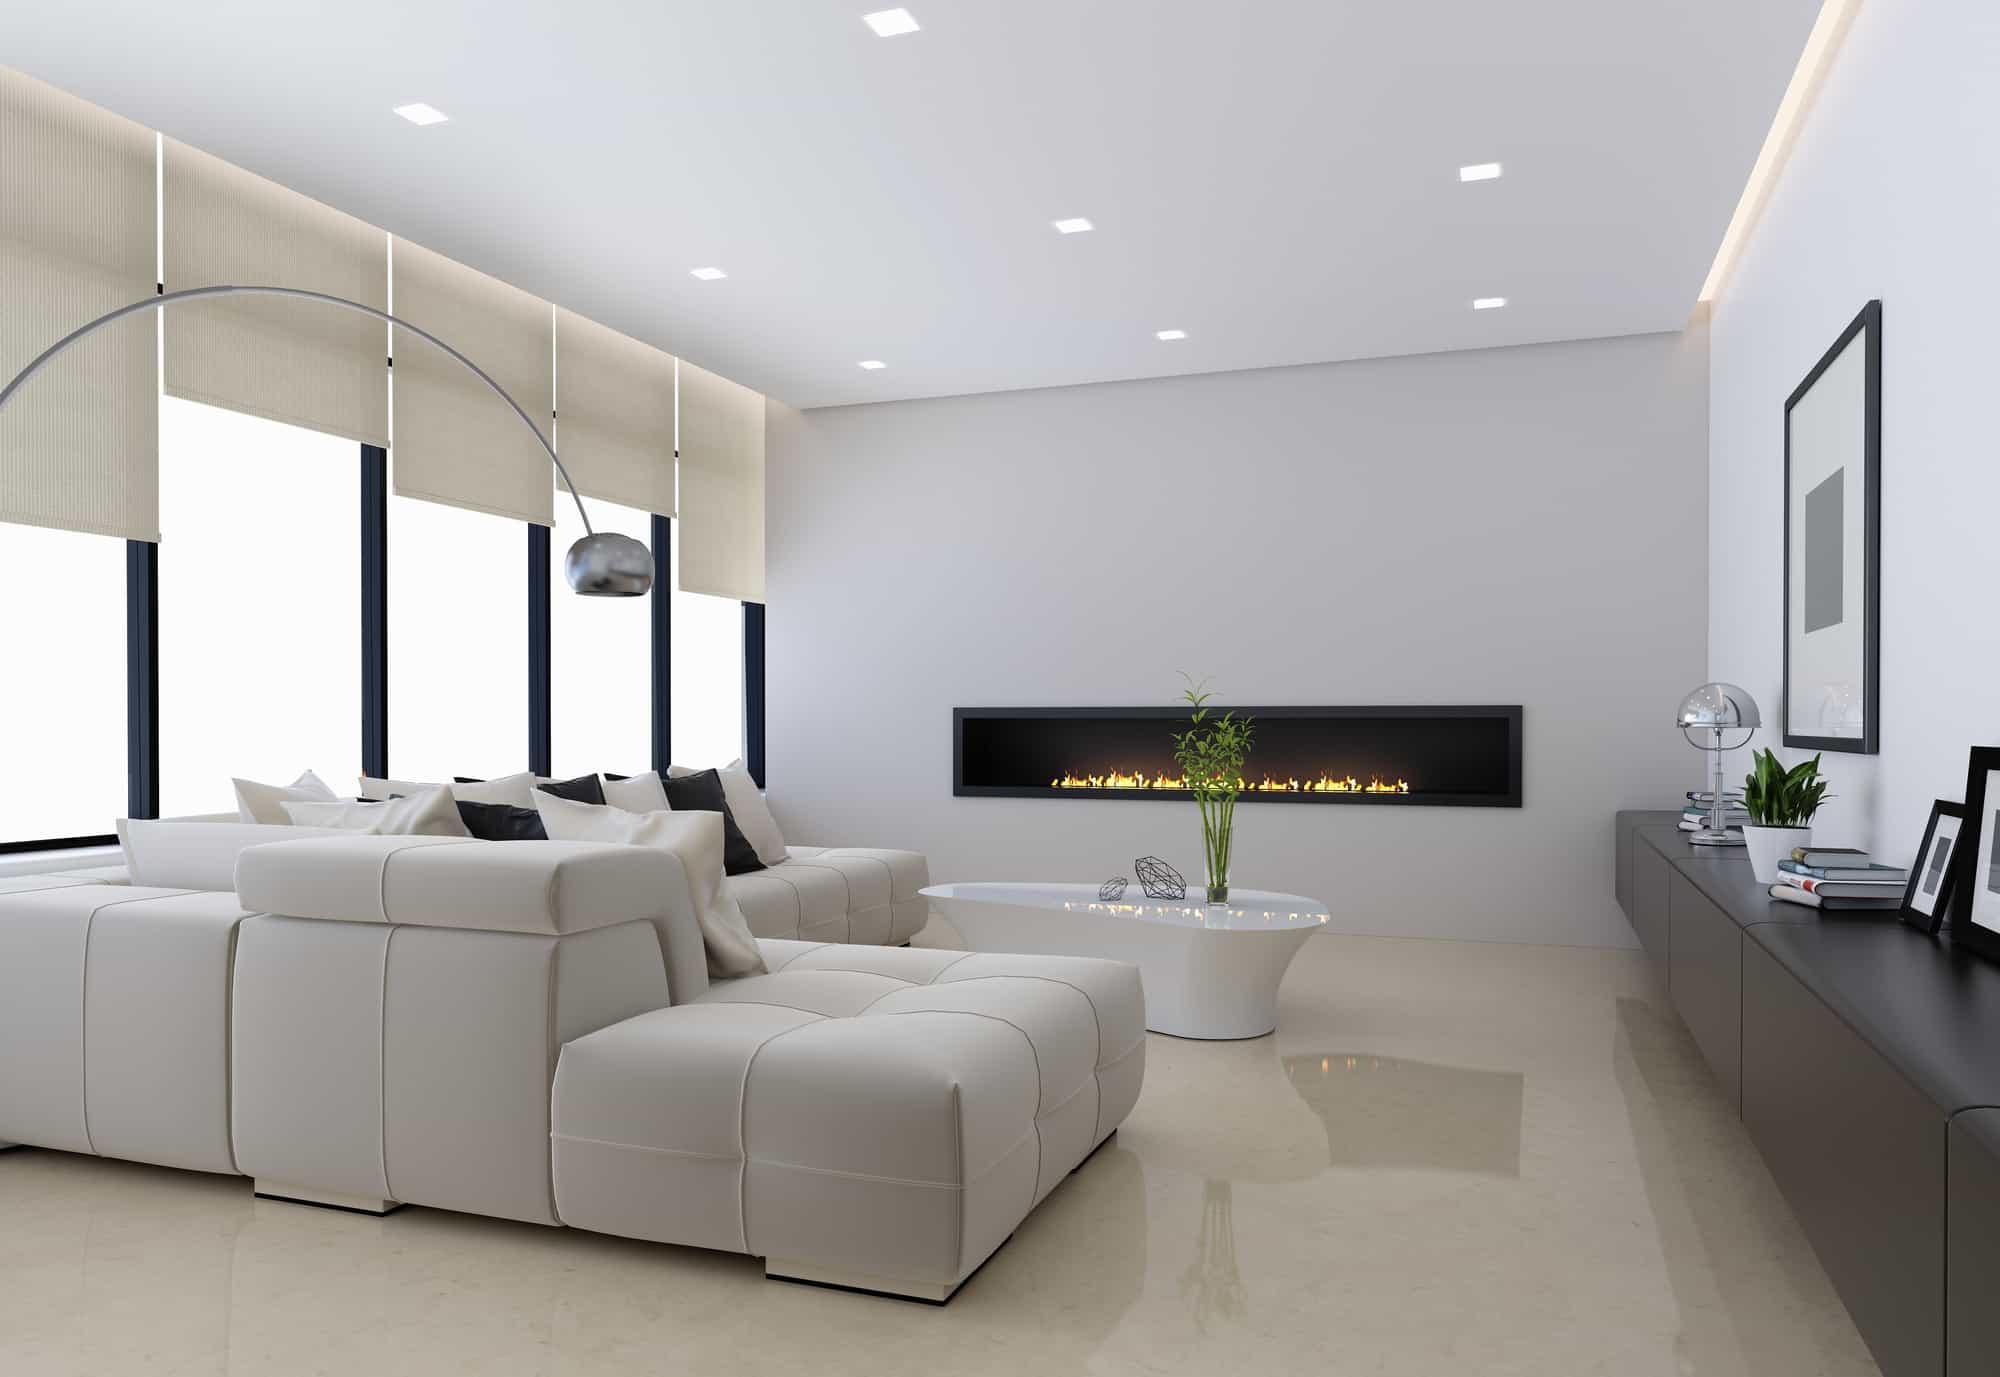 commercial blinds